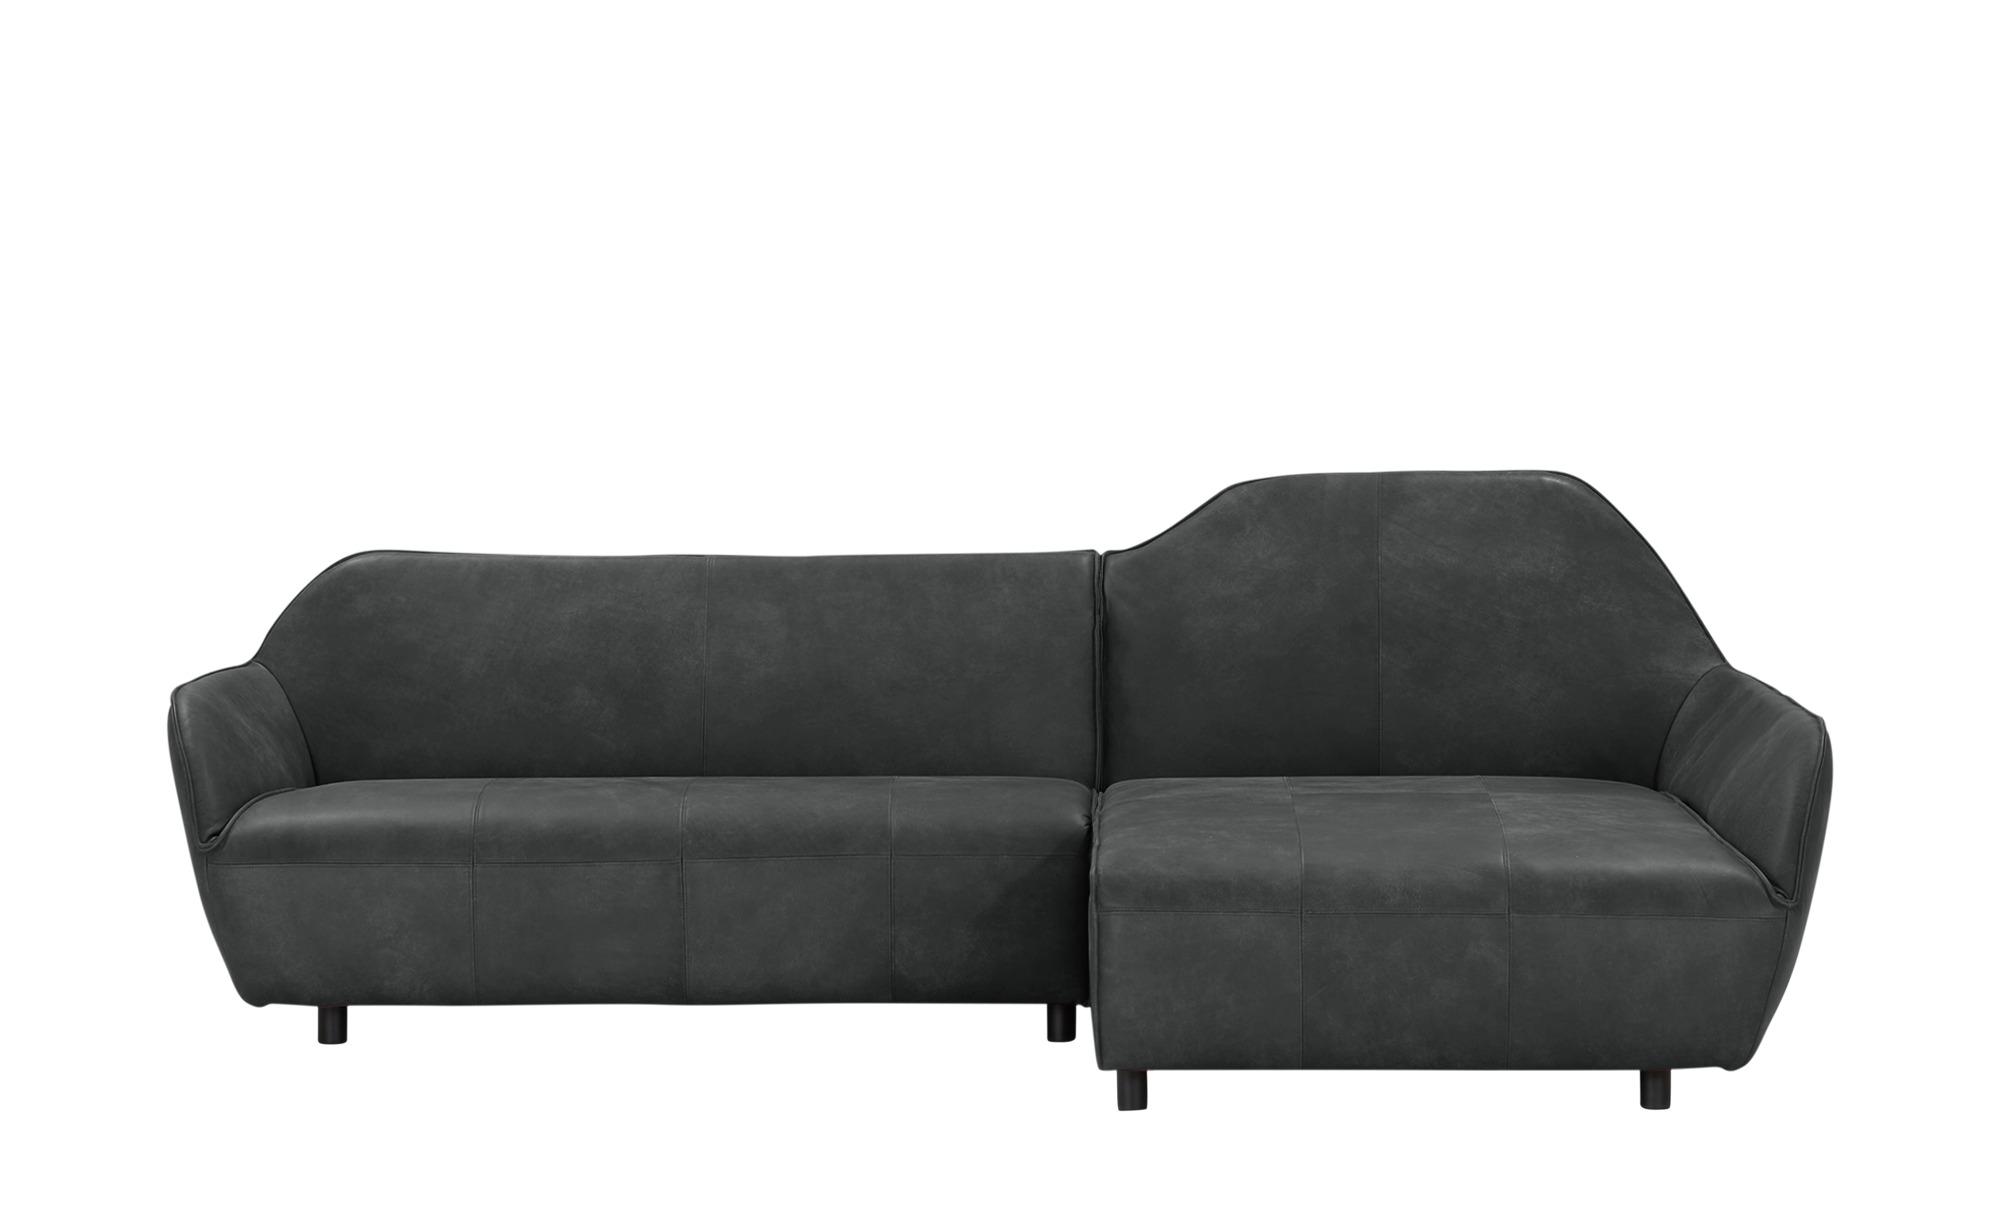 hülsta Sofa Ecksofa Leder  HS 480